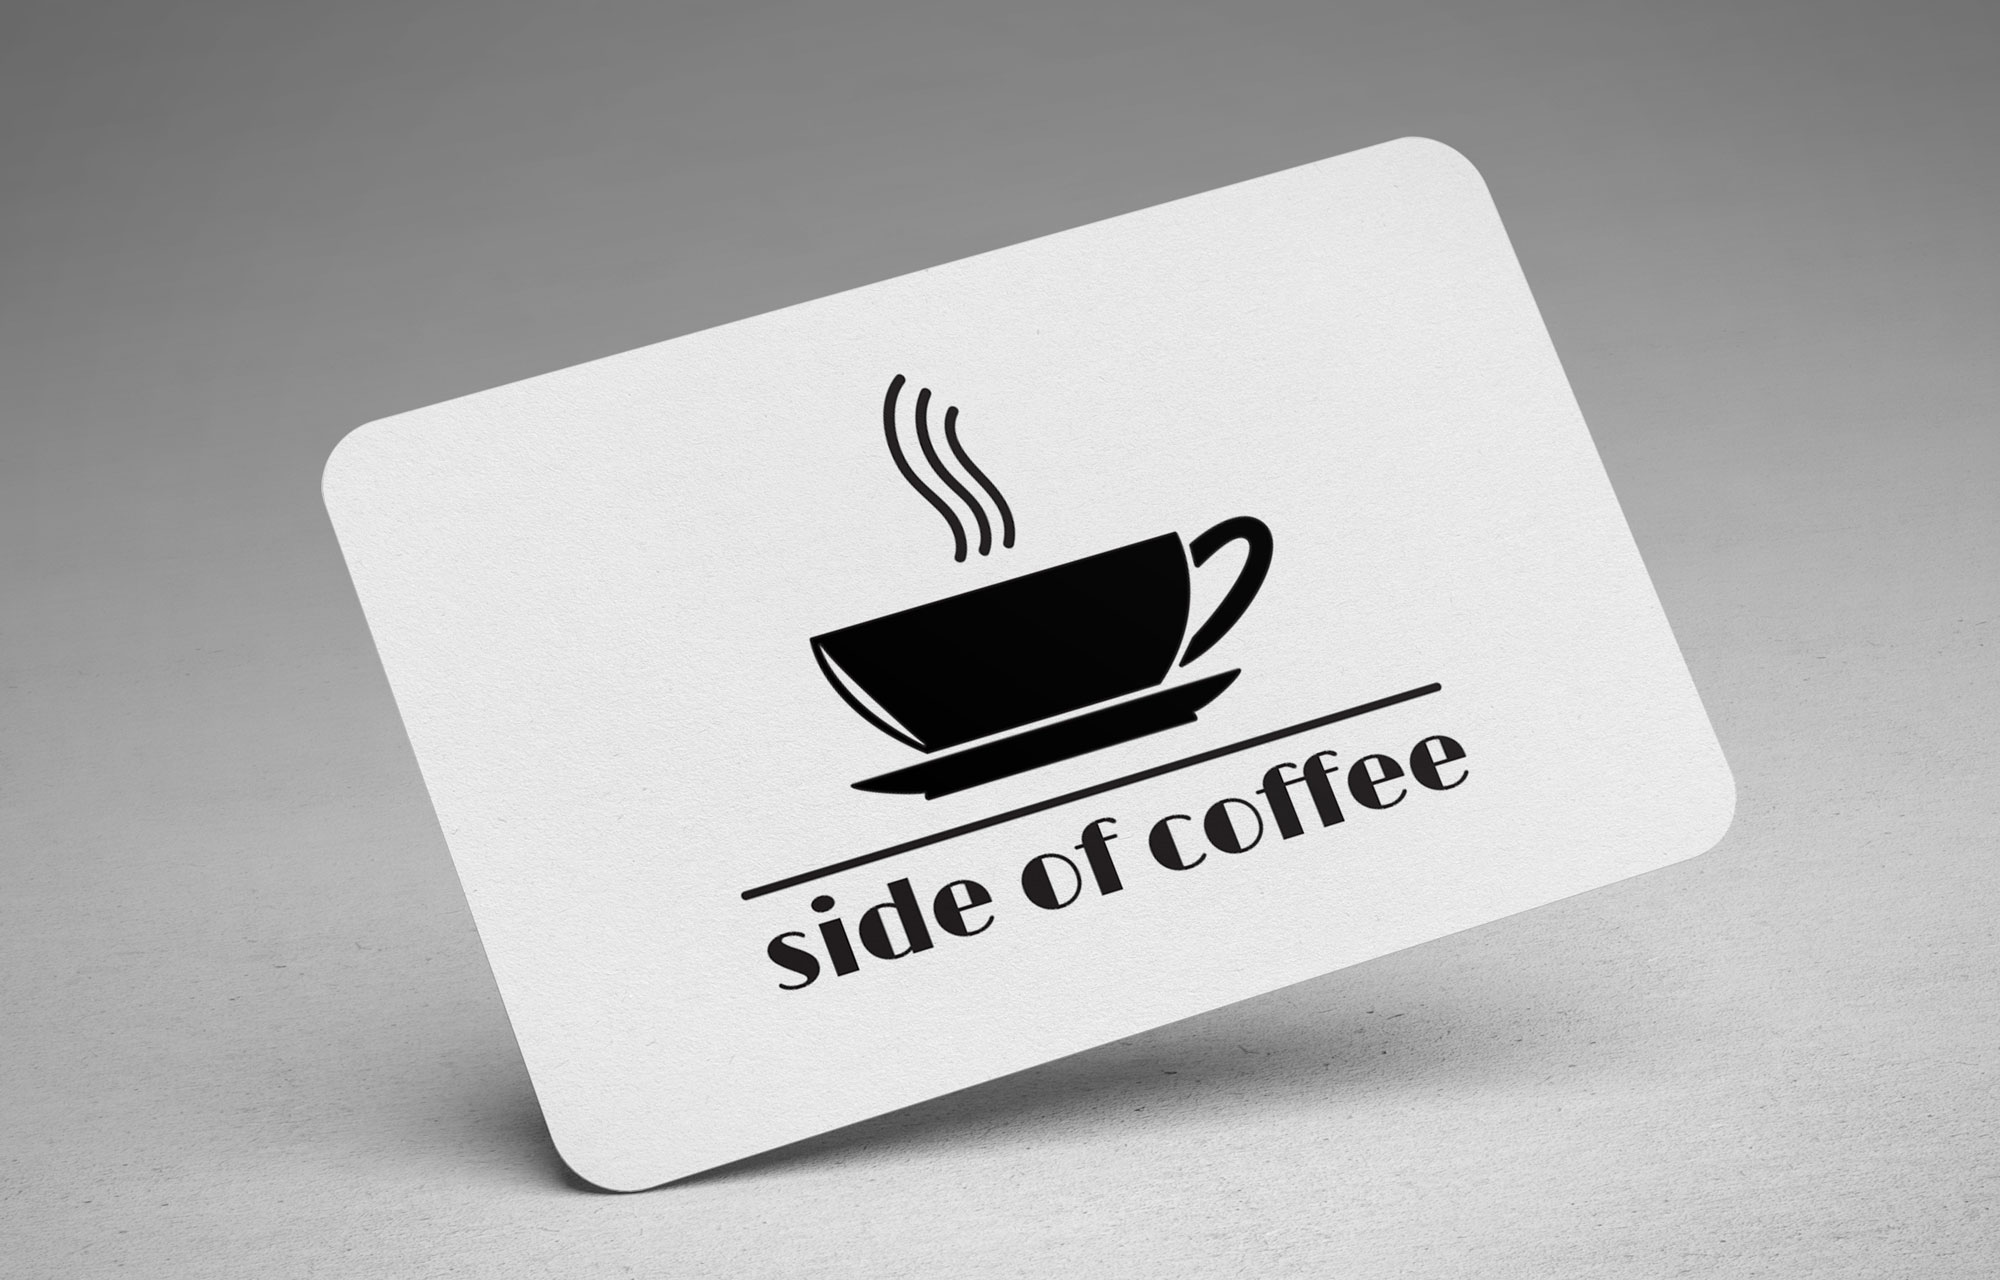 Coffee business branding, logo design, identity designed by megan alissa